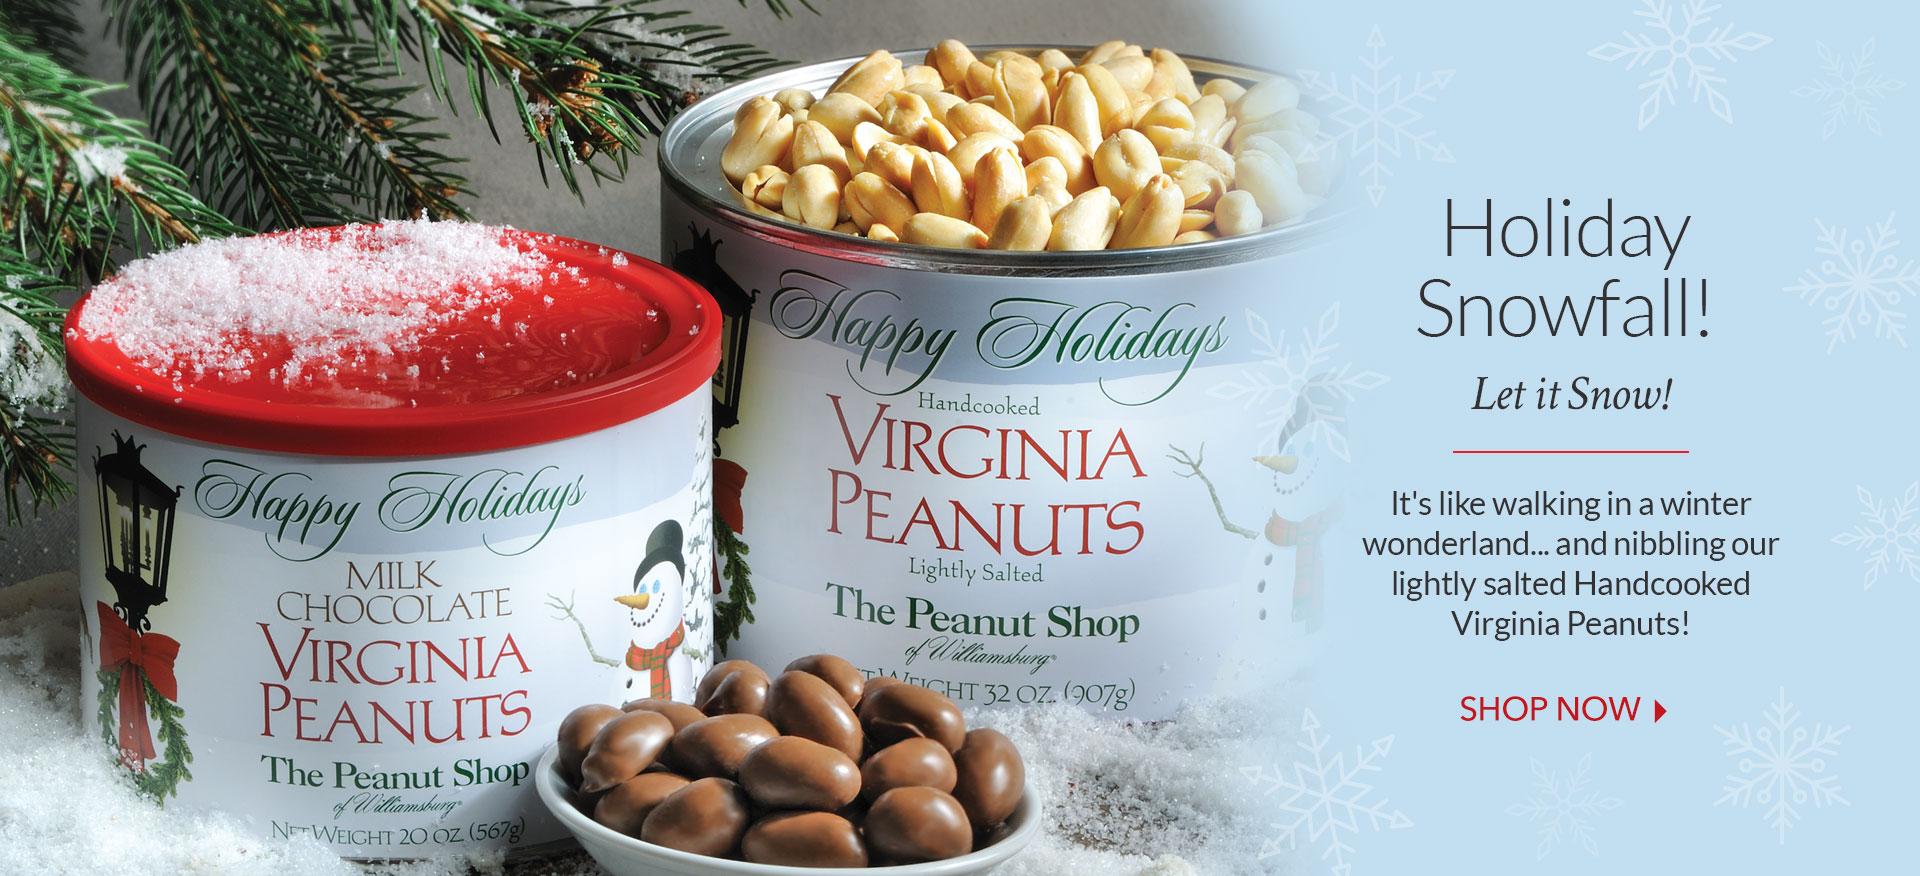 Snowfall Dark Chocolate Peanuts - The Peanut Shop of Williamsburg